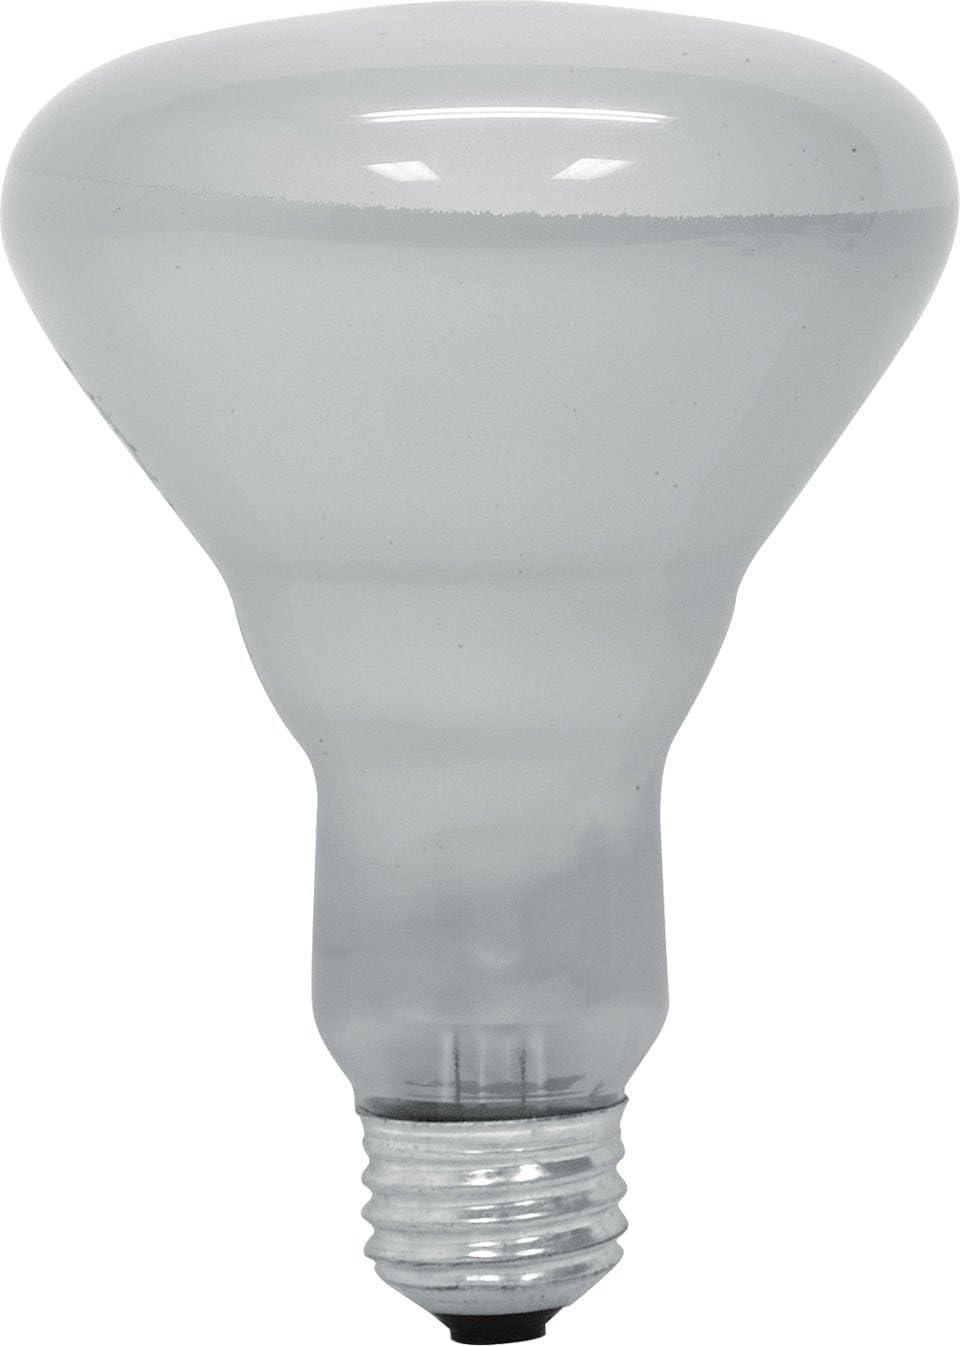 120V 65W GE Lighting 20996 Medium Base BR30 Reflector Plant Floodlight Bulb